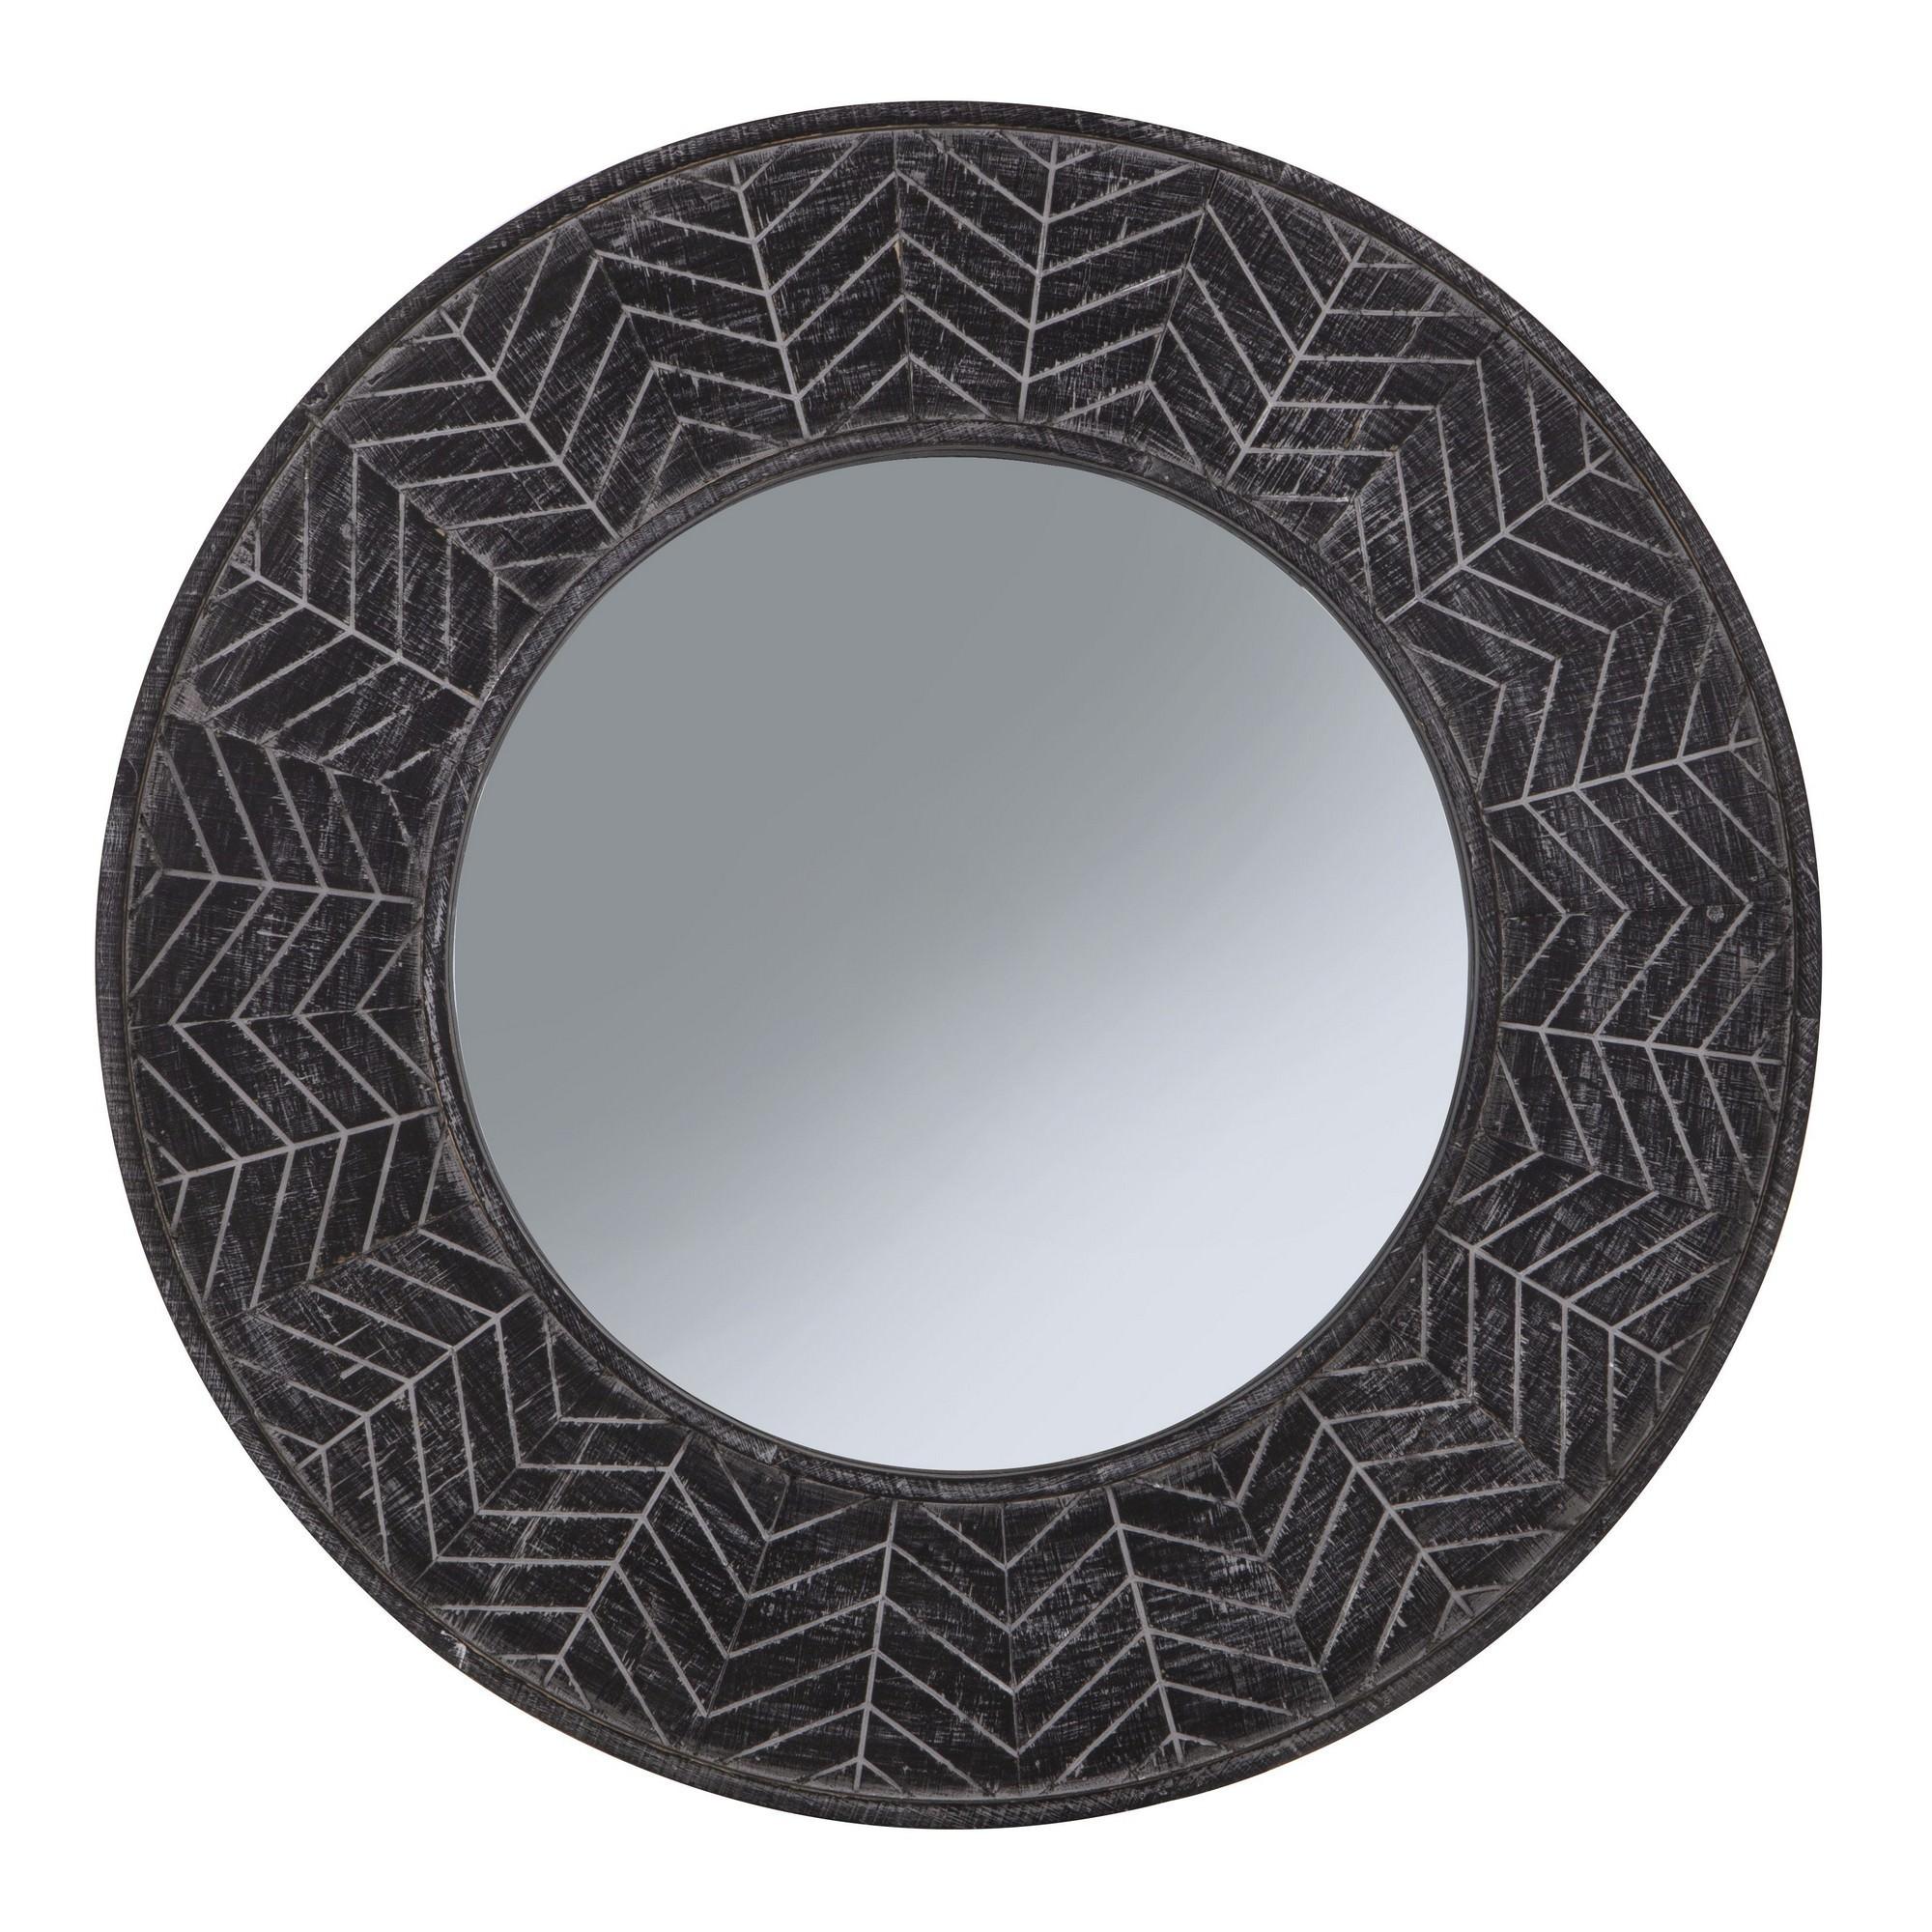 Aero Handmade Wooden Frame Round Wall Mirror, 80cm